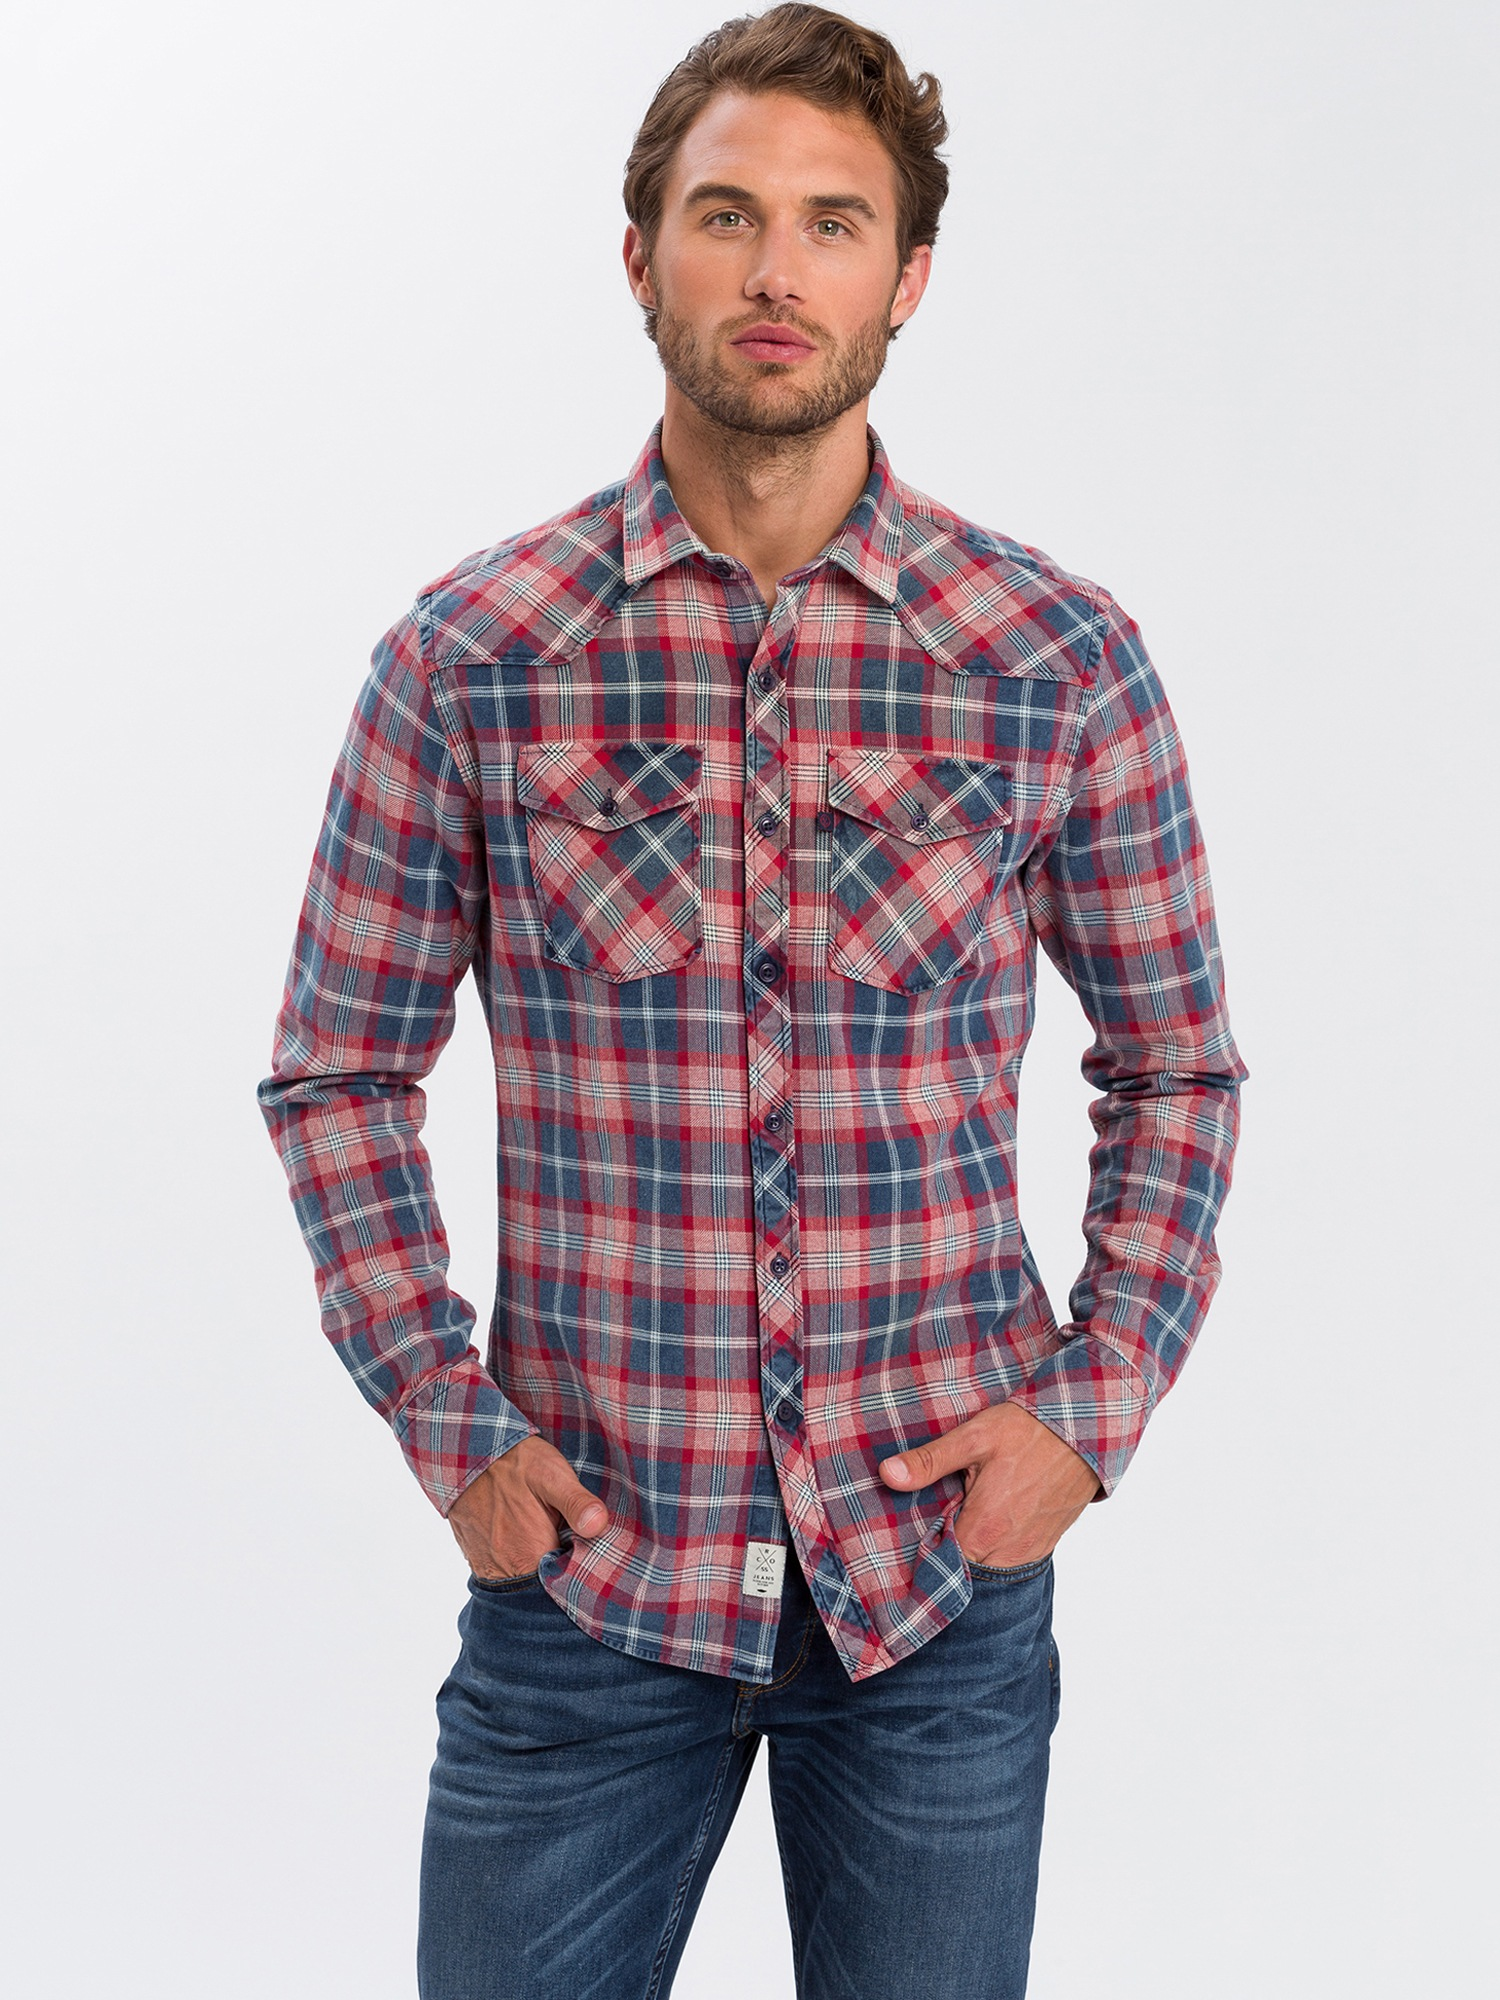 Cross Jeans Karohemd 35246 | Bekleidung > Hemden > Jeanshemden | cross jeans